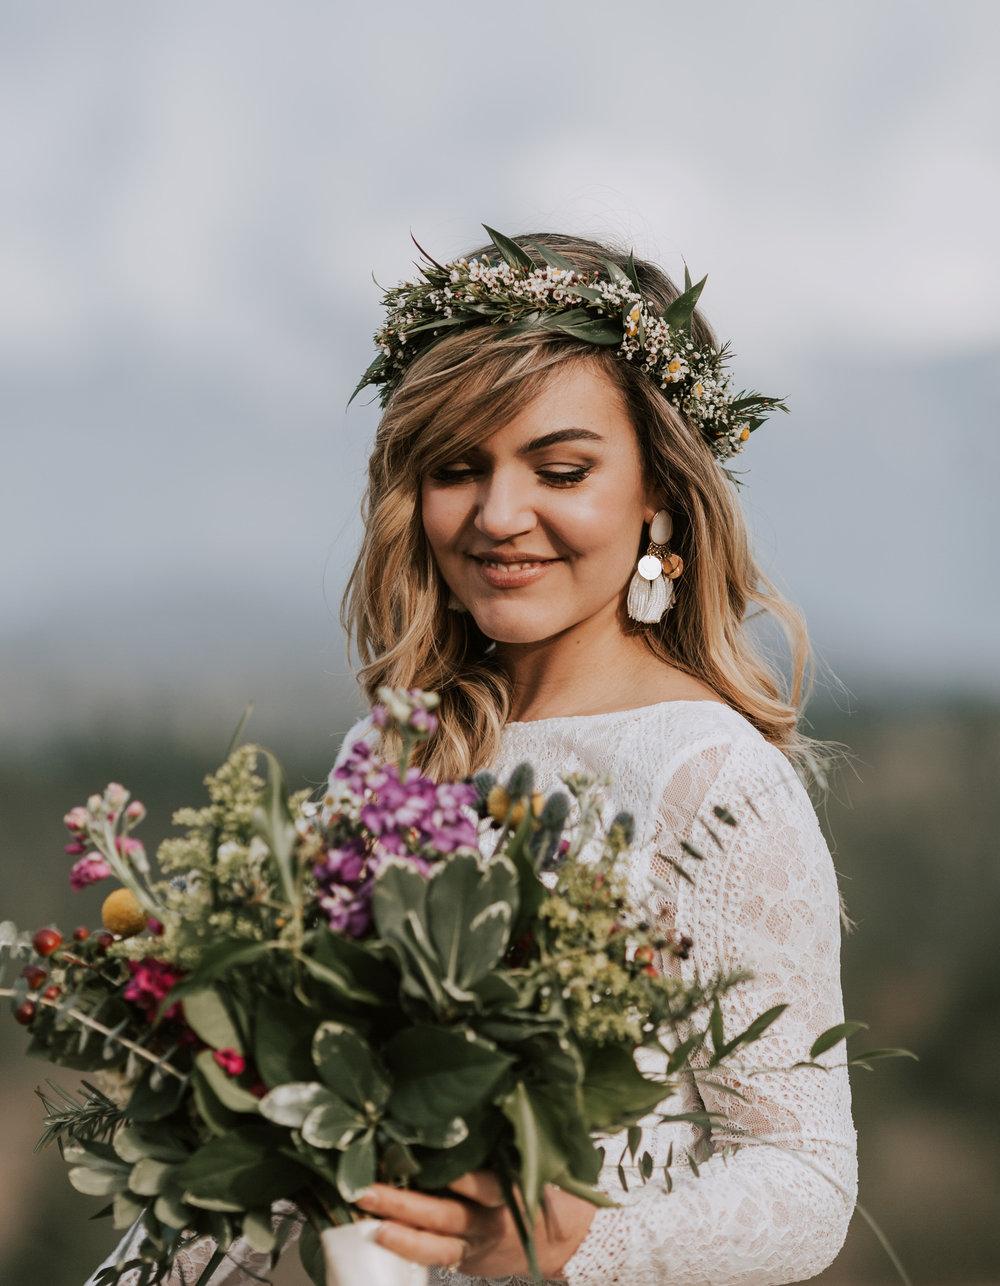 Sunshine Coast Wedding Photos - Mountain Wedding Photos - Sunshine Coast Wedding Photographer - Vancouver Wedding Photographer - Jennifer Picard370-1.JPG